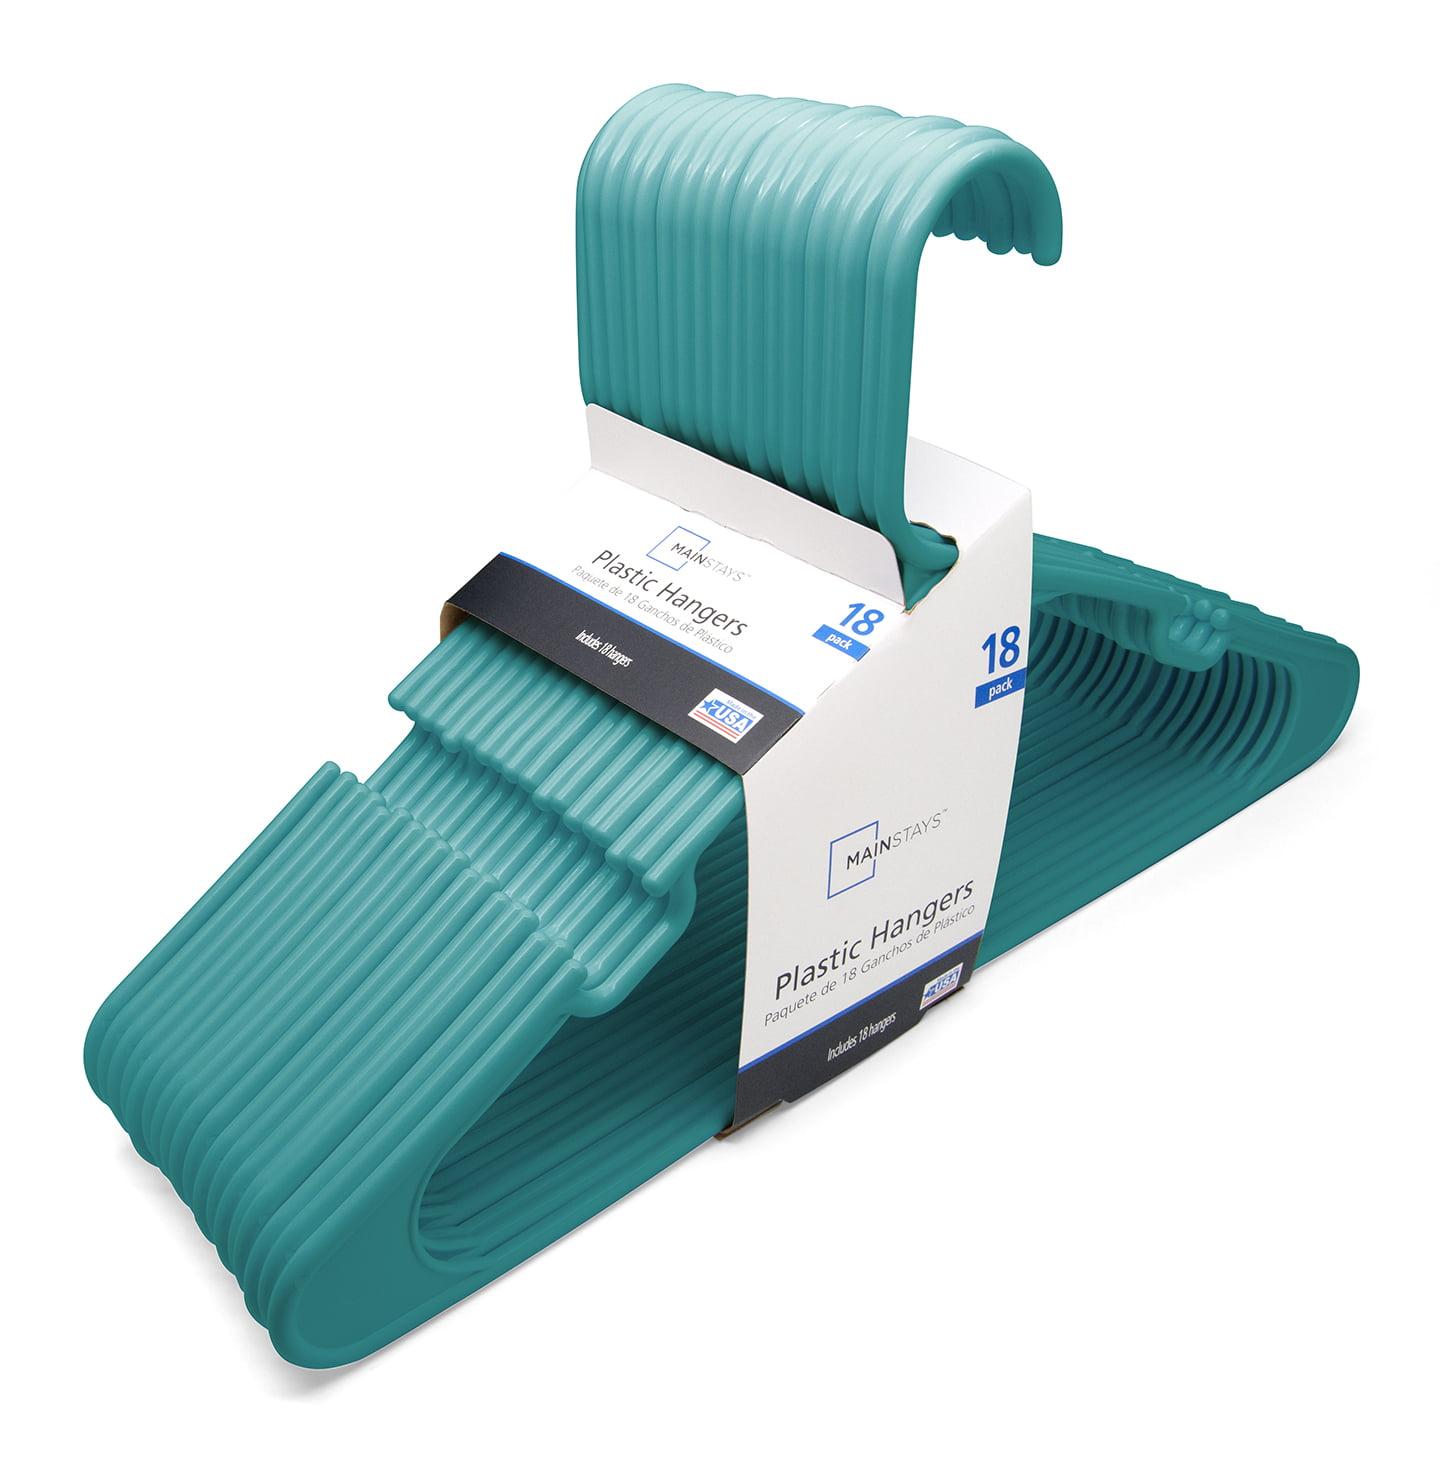 Mainstays Ms 18pk Cool Water Plastic Hangers